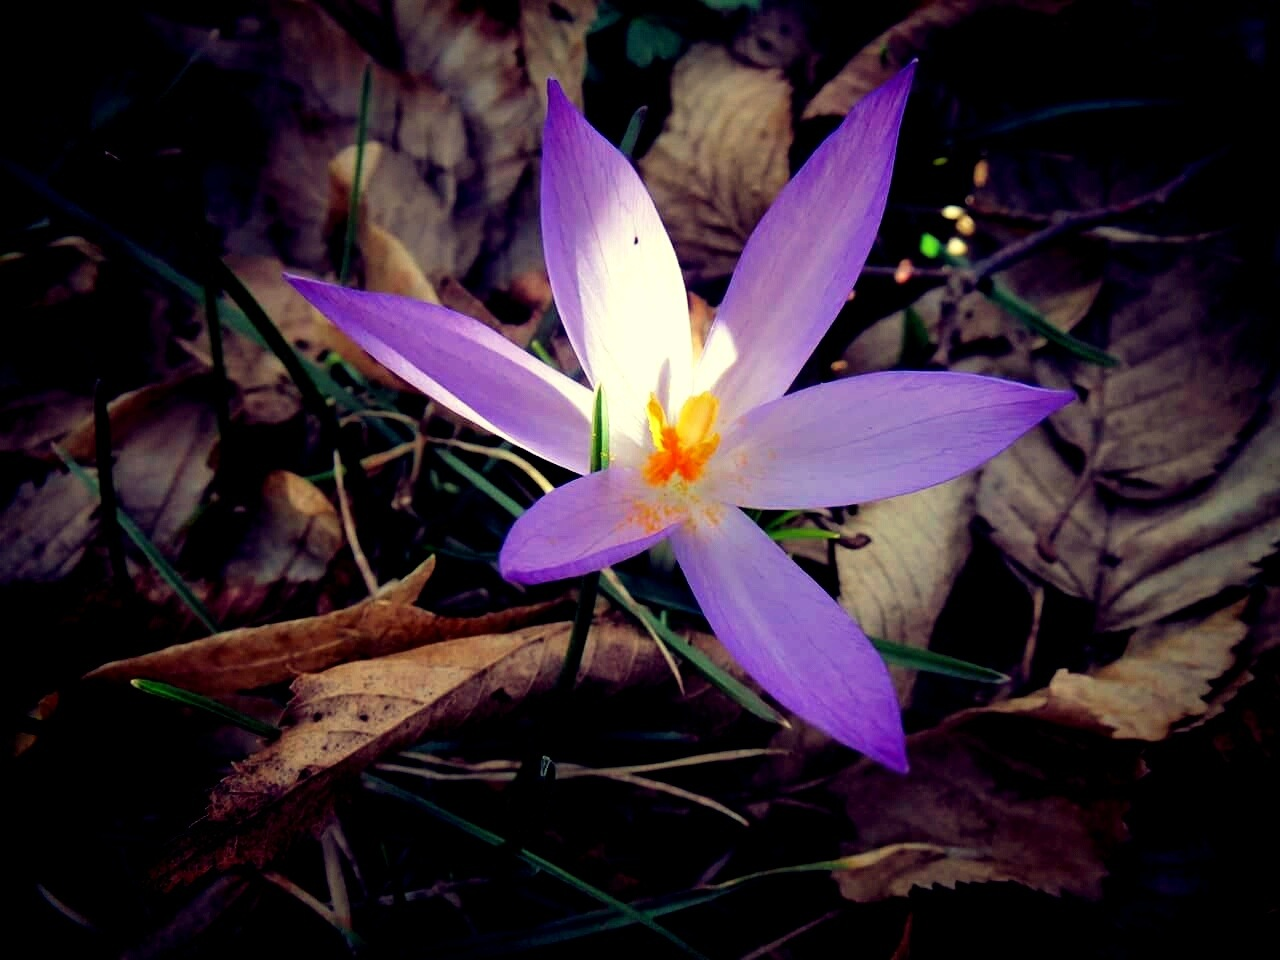 purple star by Iri Rusu